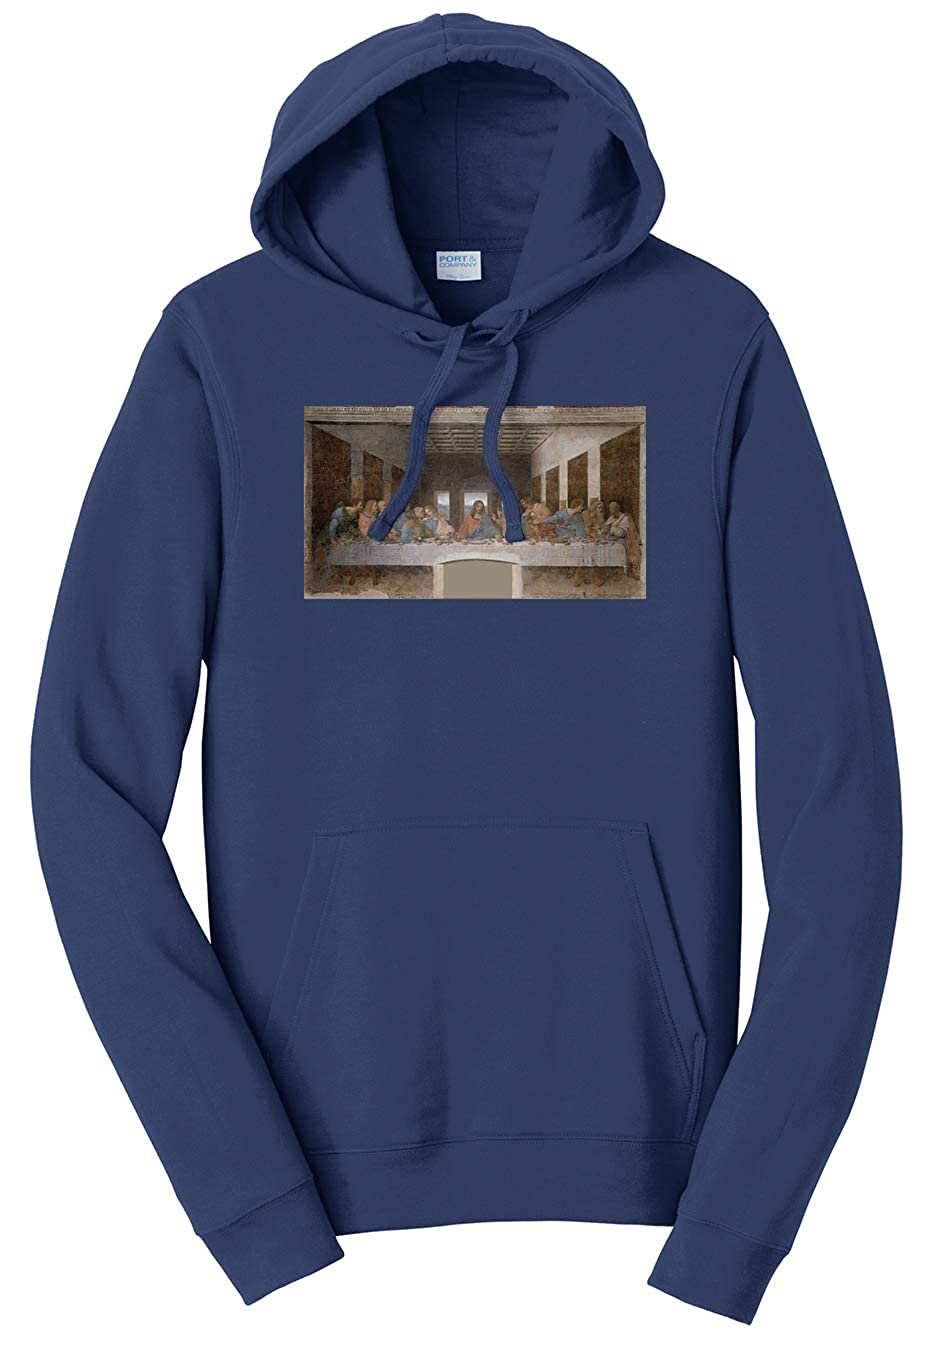 Tenacitee Unisex The Last Supper Sweatshirt